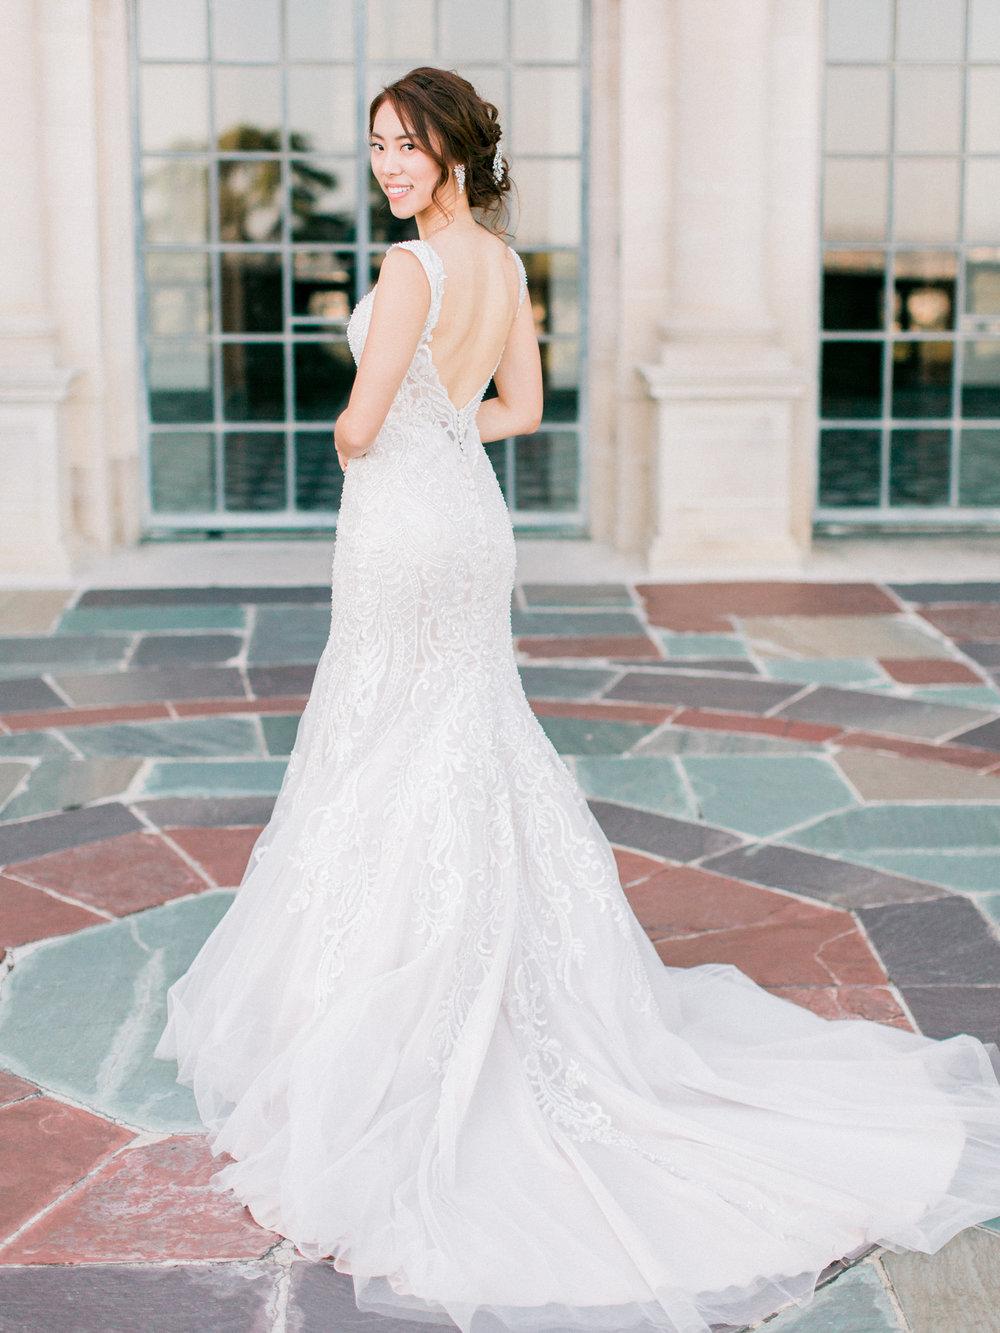 Koman Photography-Greystone Mansion Wedding Wedding-5346.jpg